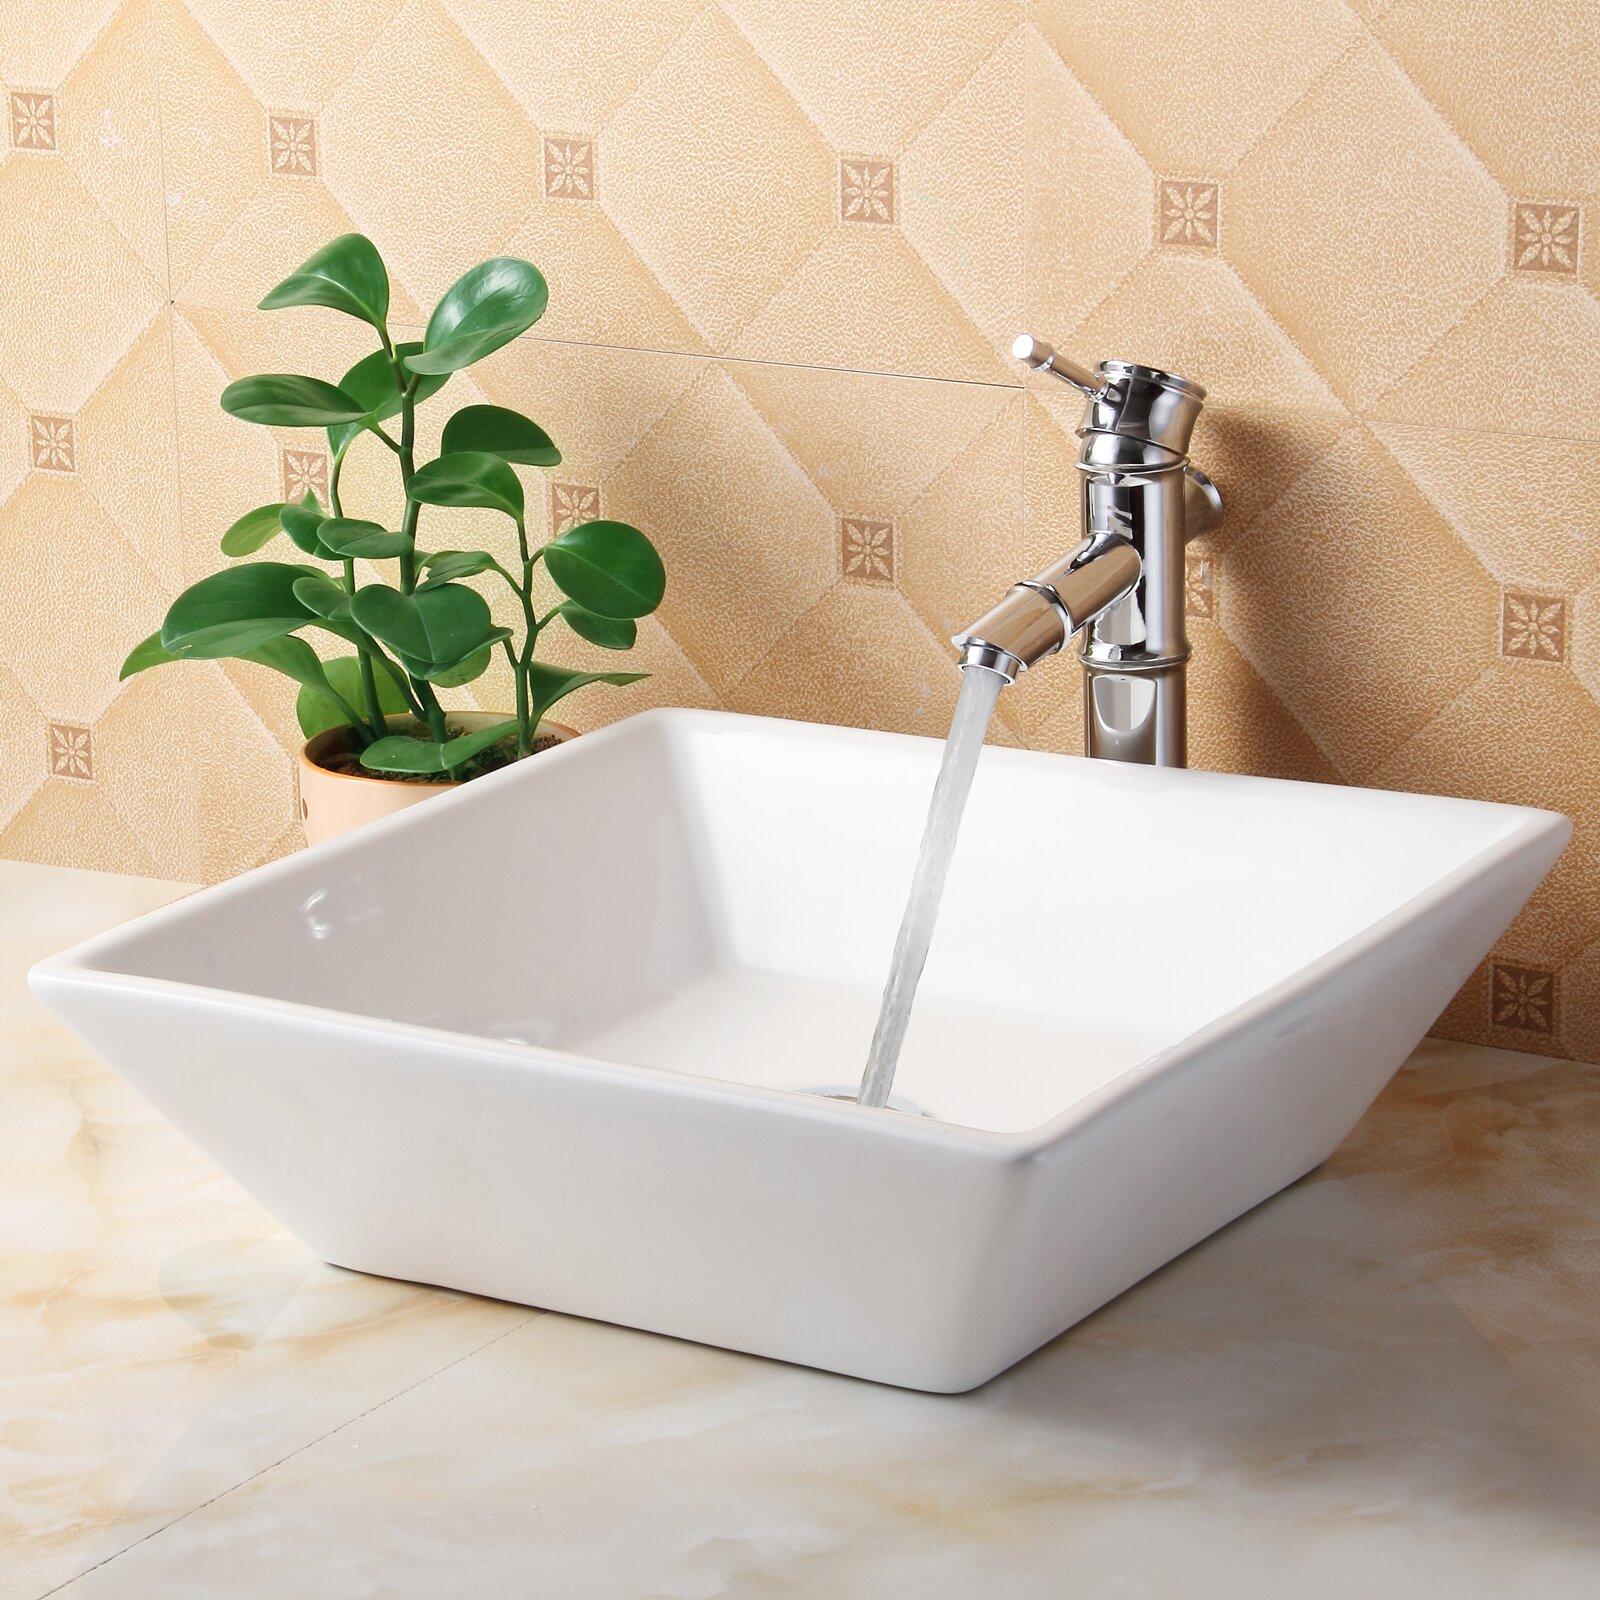 Elite Ceramic Square Bathroom Sink & Reviews